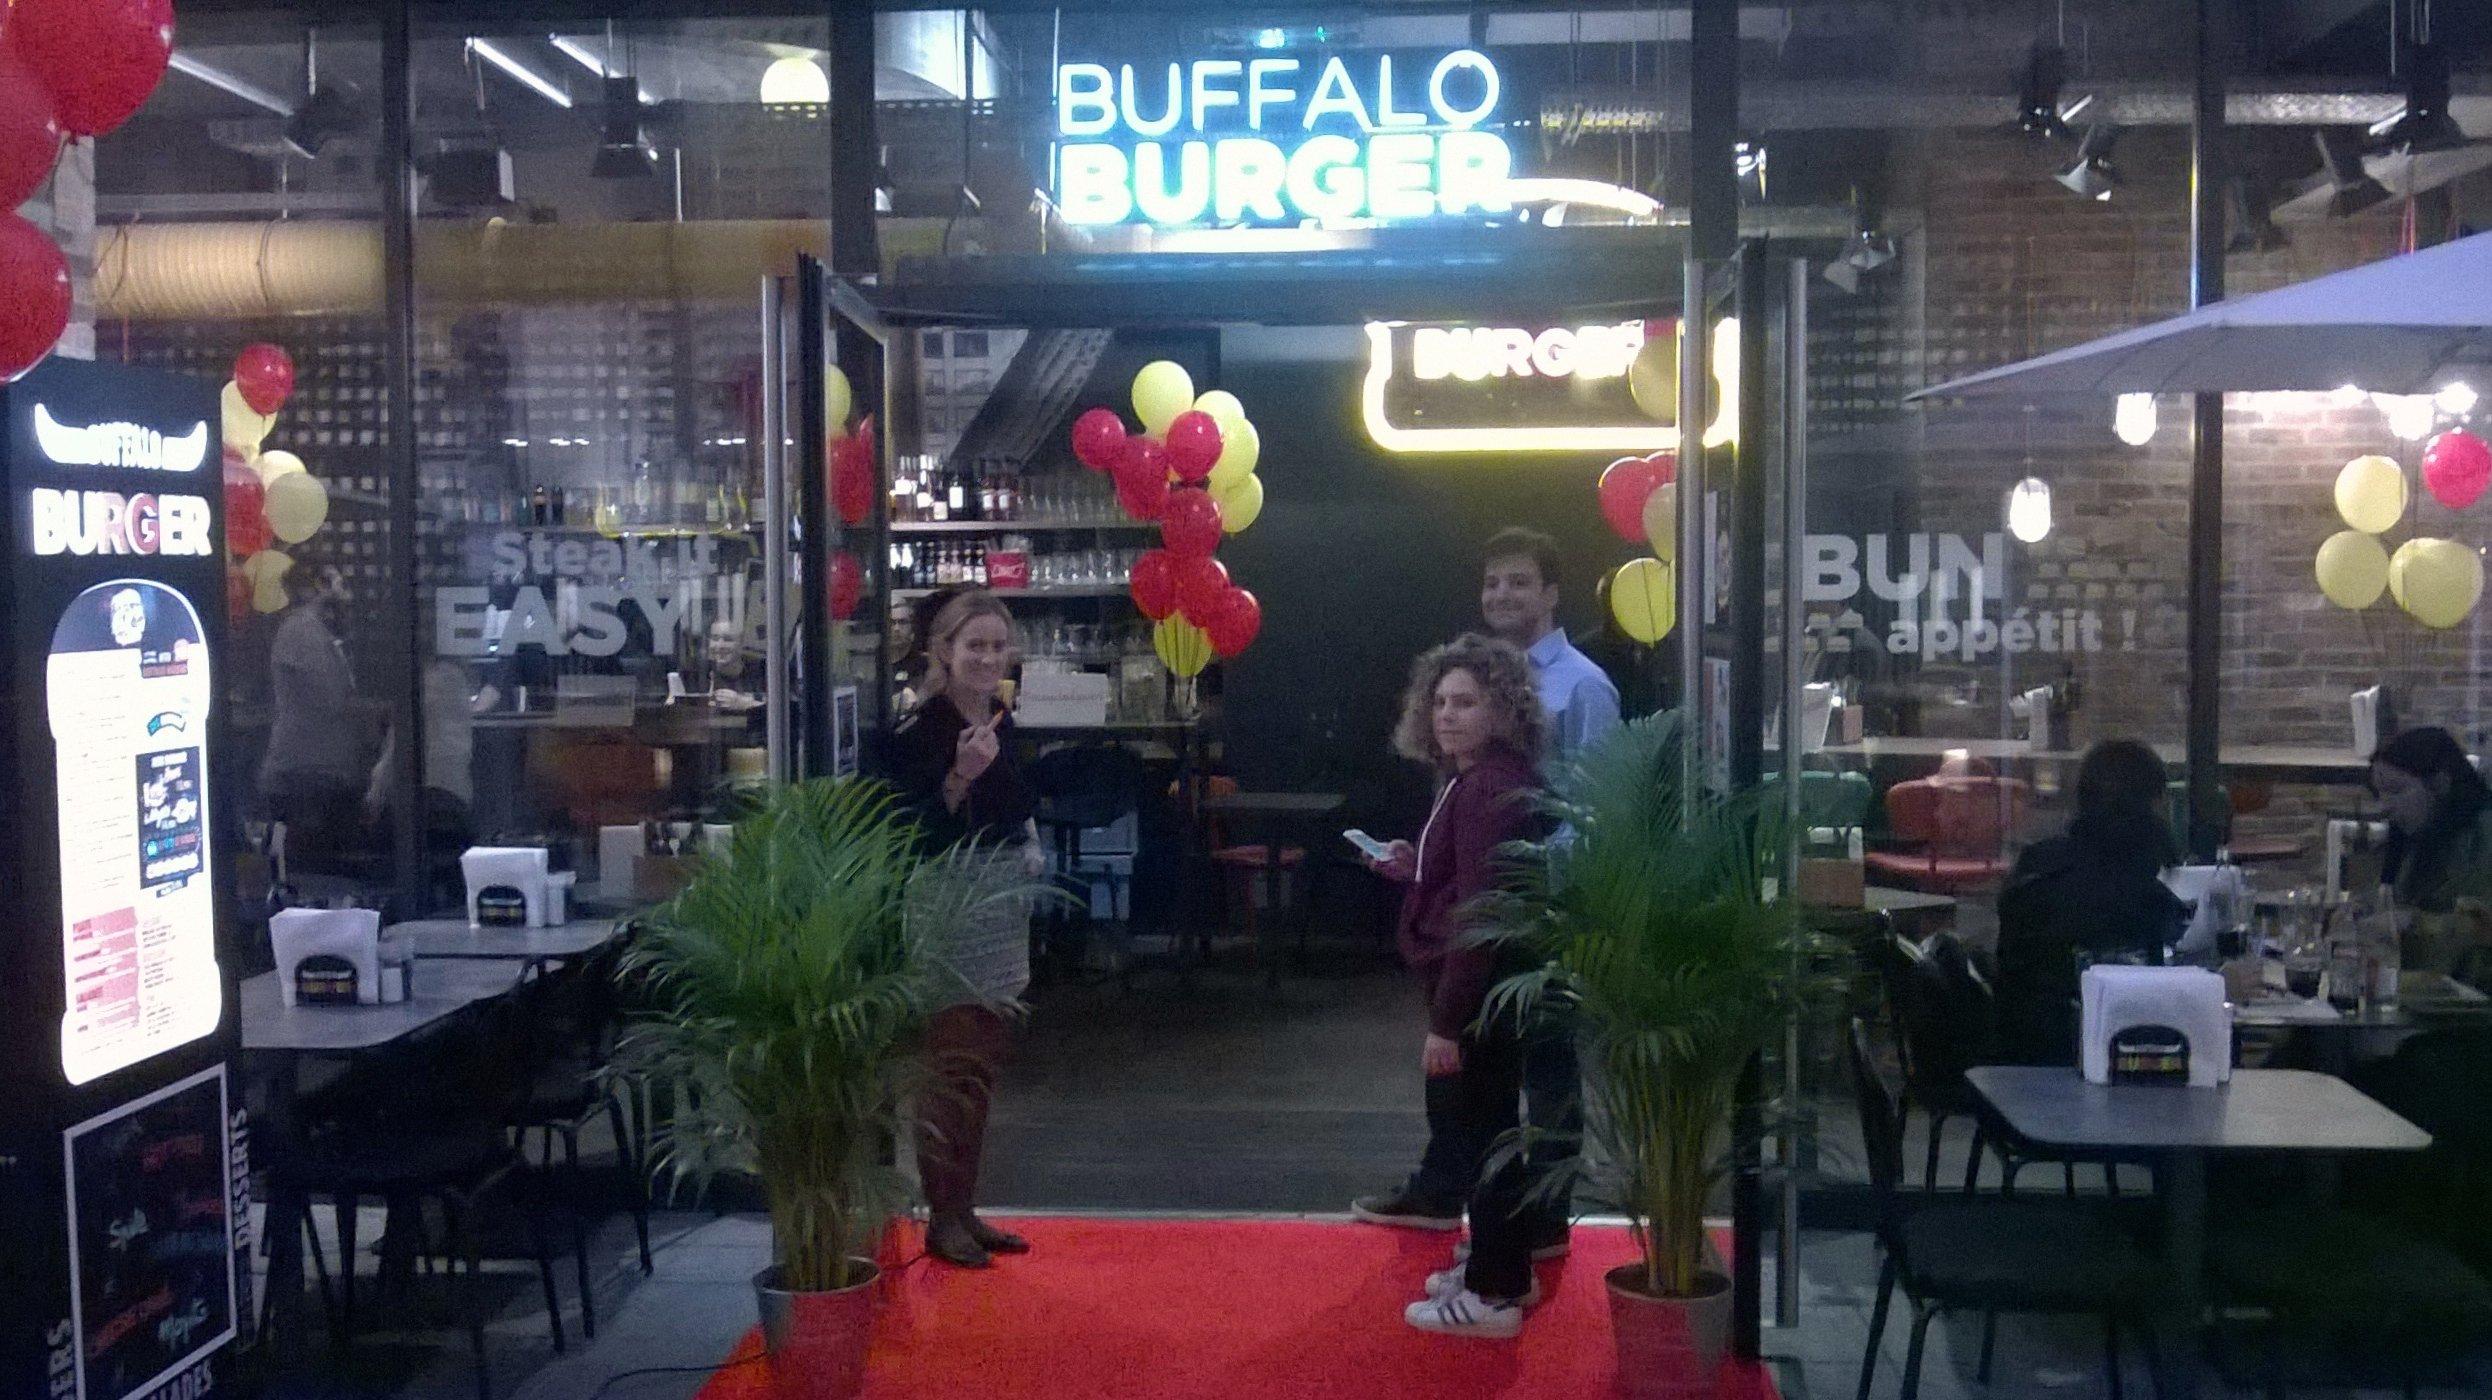 Buffalo Burger : le bon plan afterwork